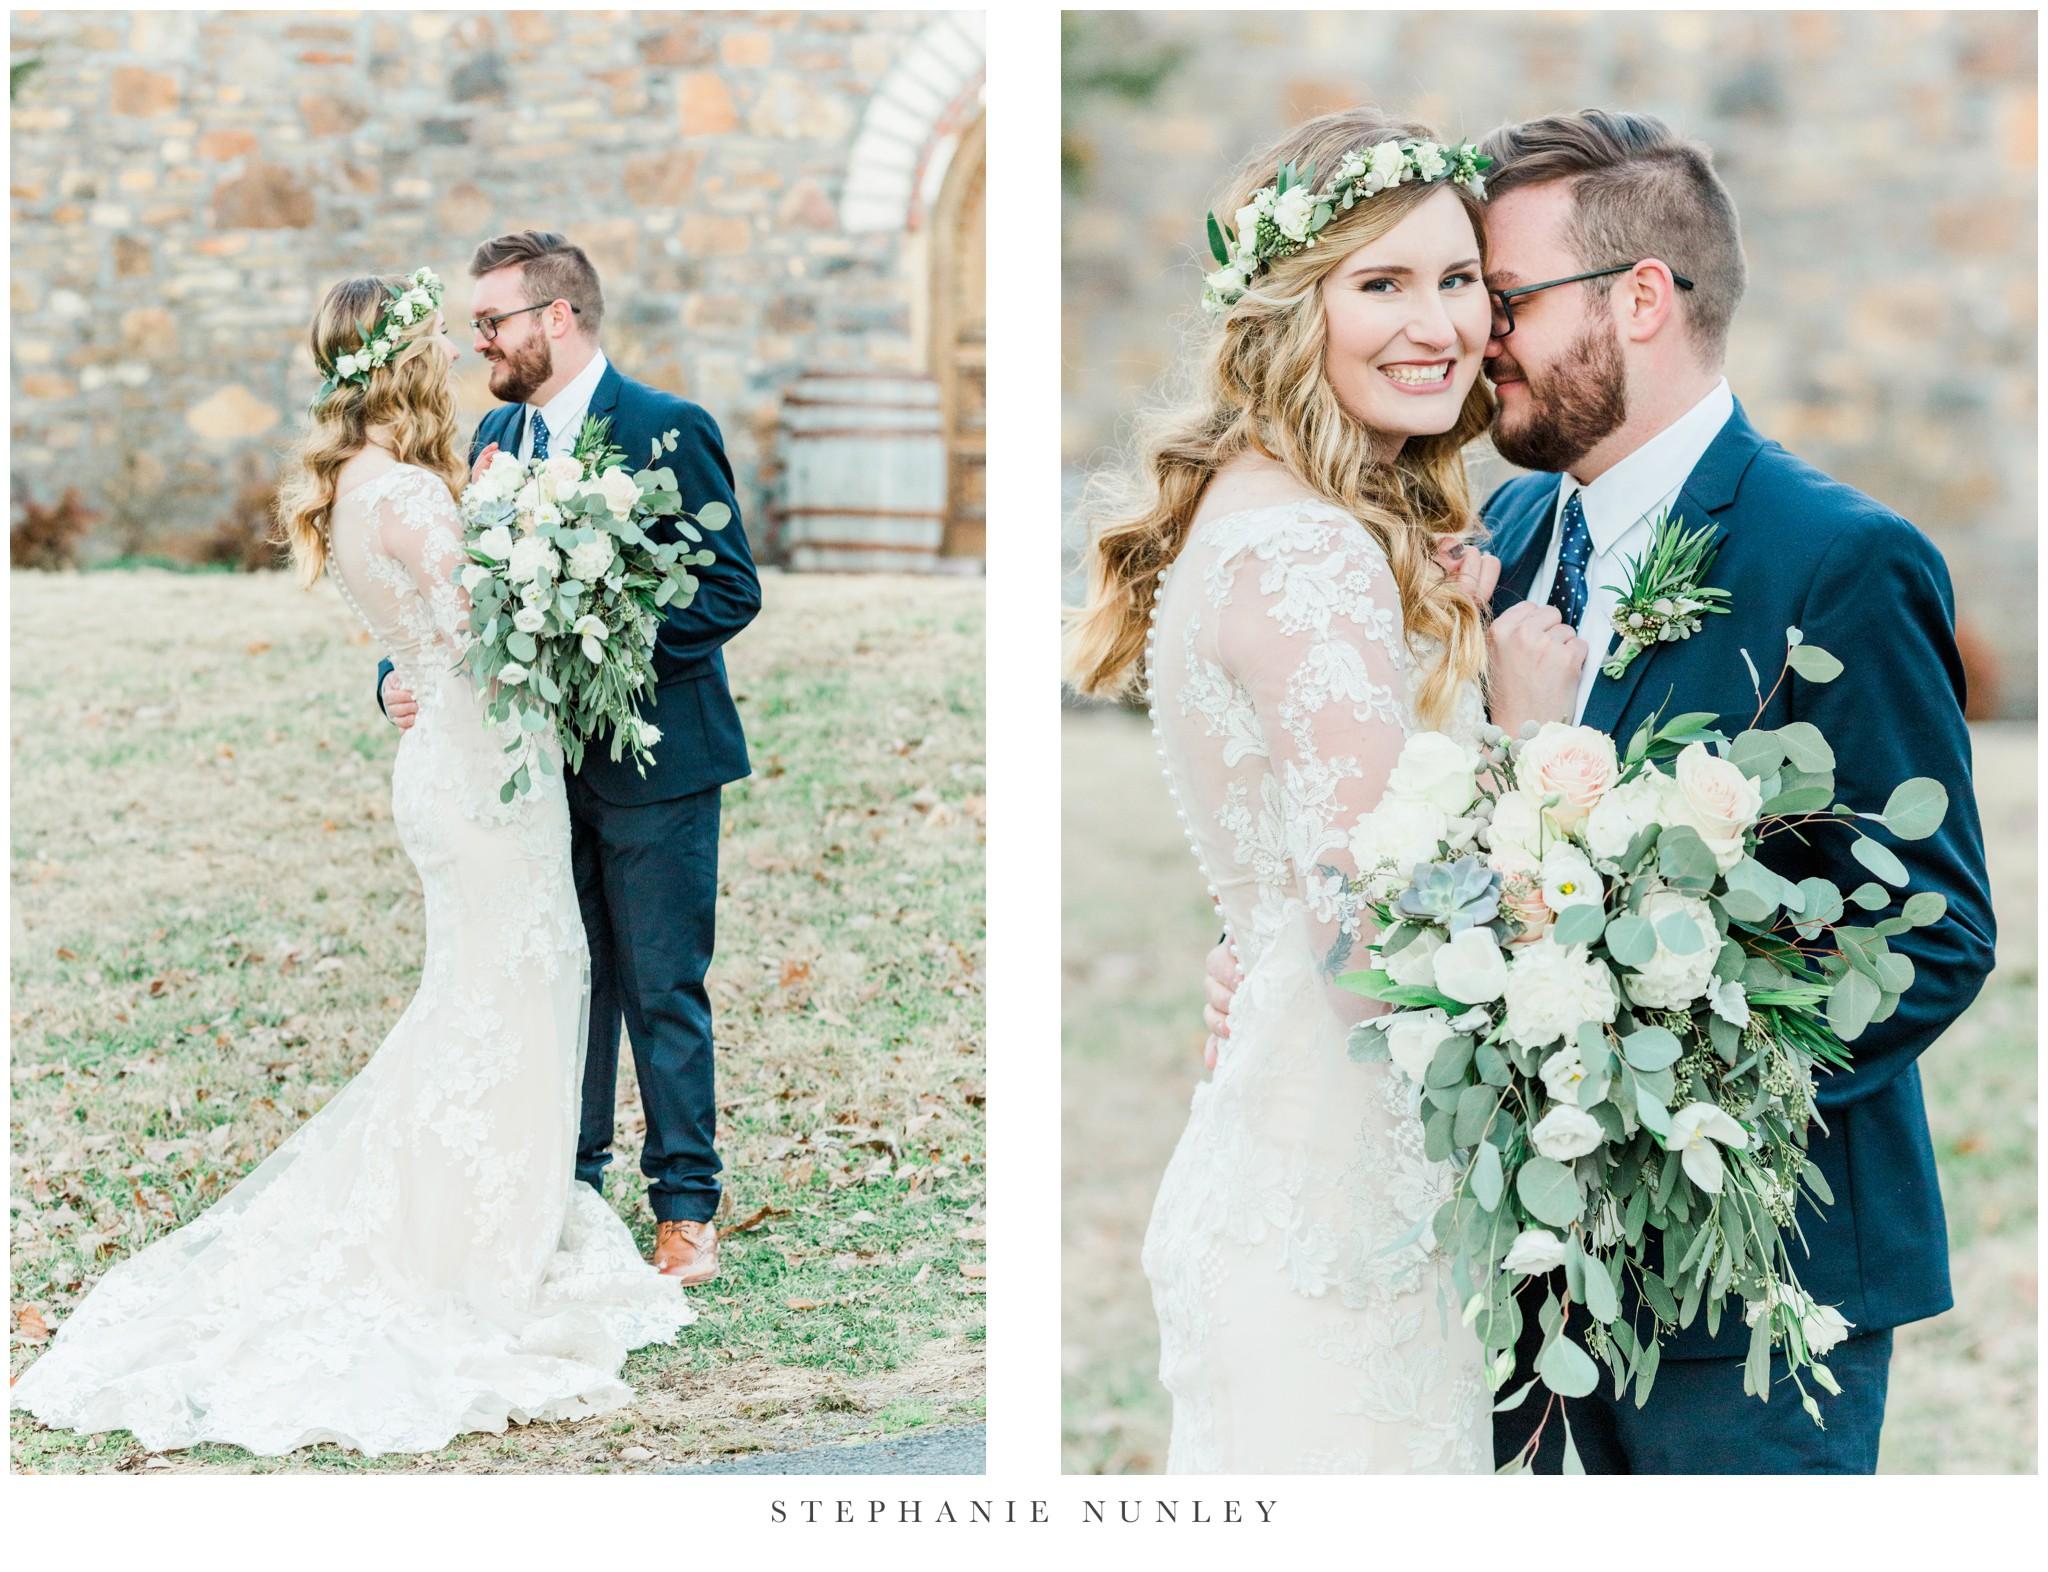 sassafrass-springs-vineyard-film-wedding-photos-69.jpg